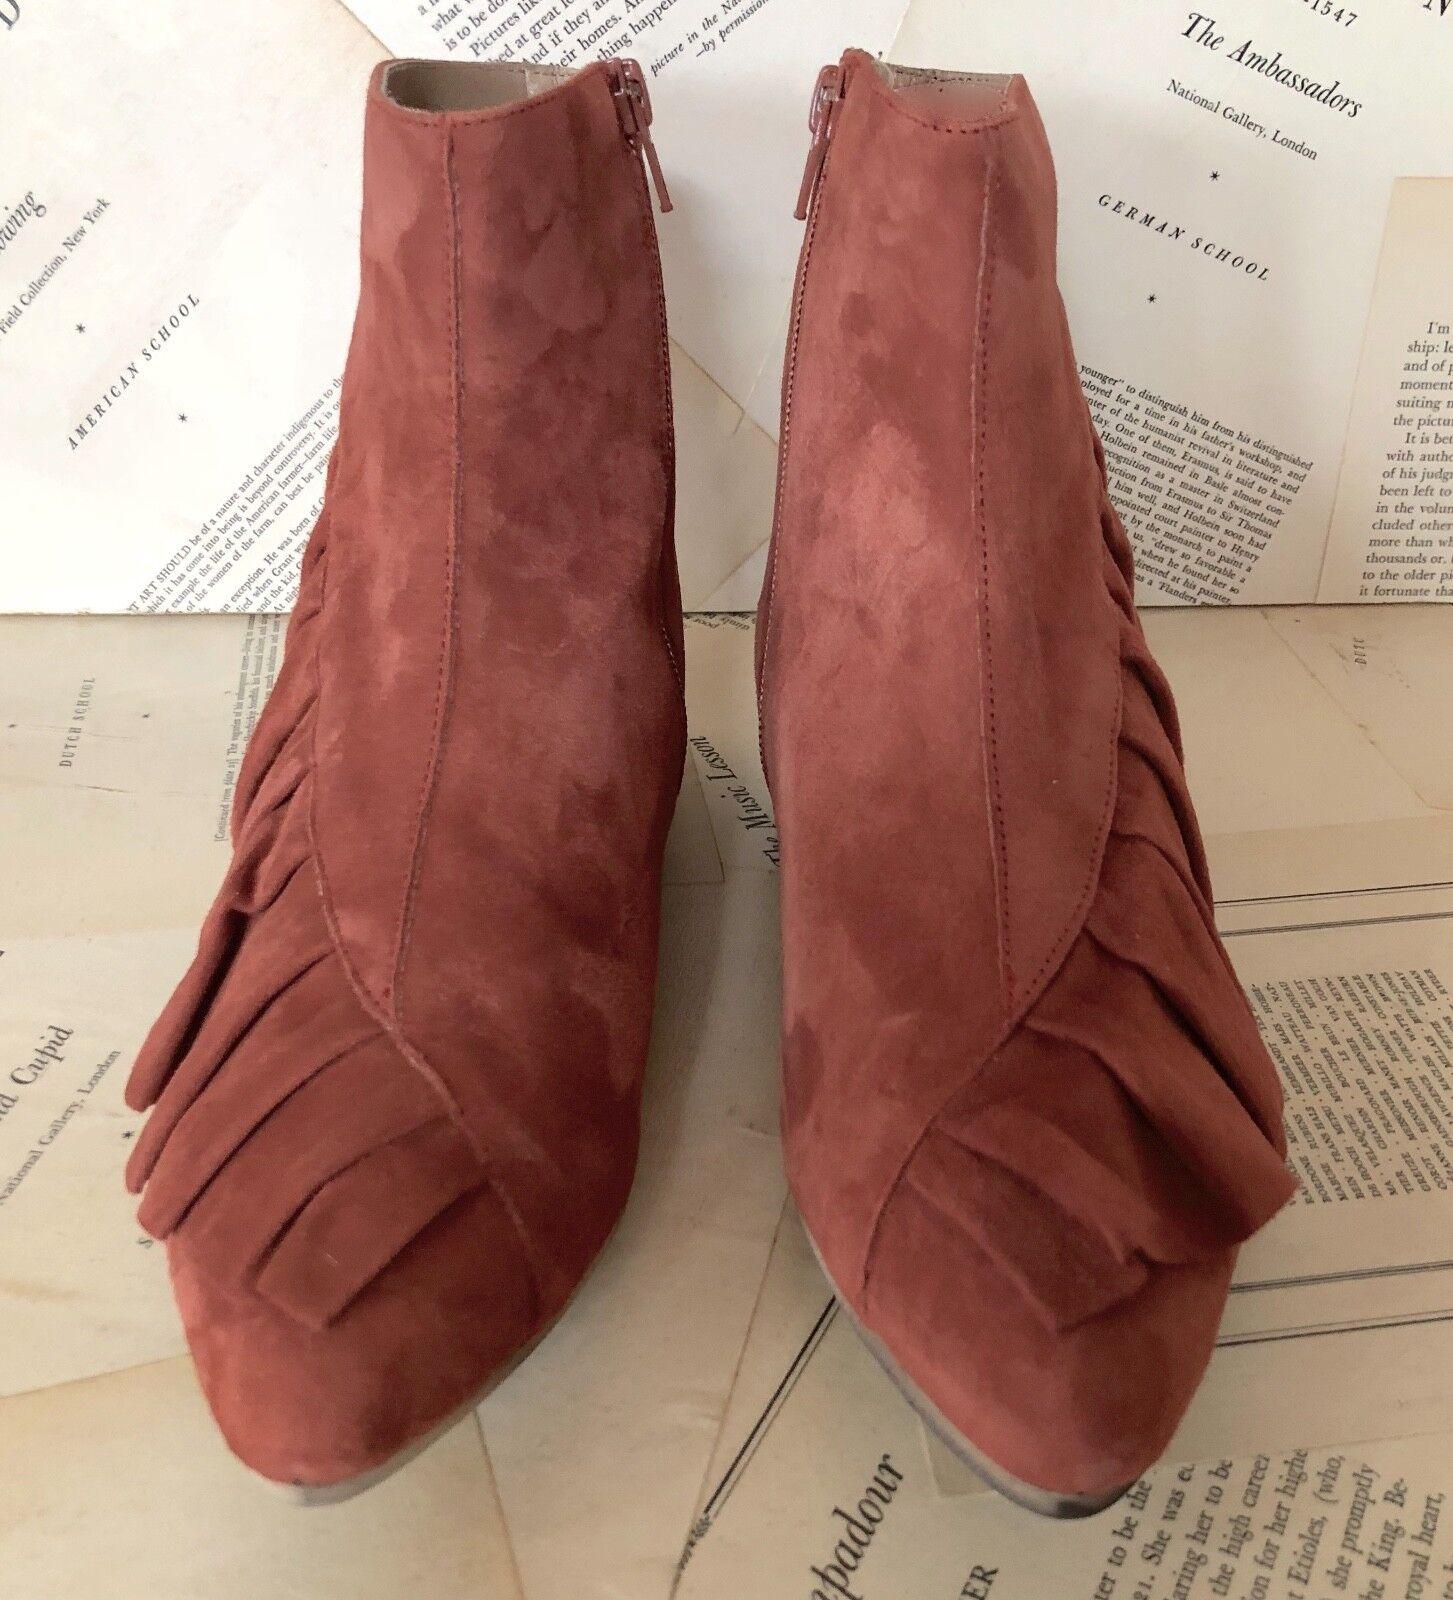 NIB Anthropologie rust Suede Ruffled Side  Zipper Ankle Stiefel 38  Side  7.5 19063d